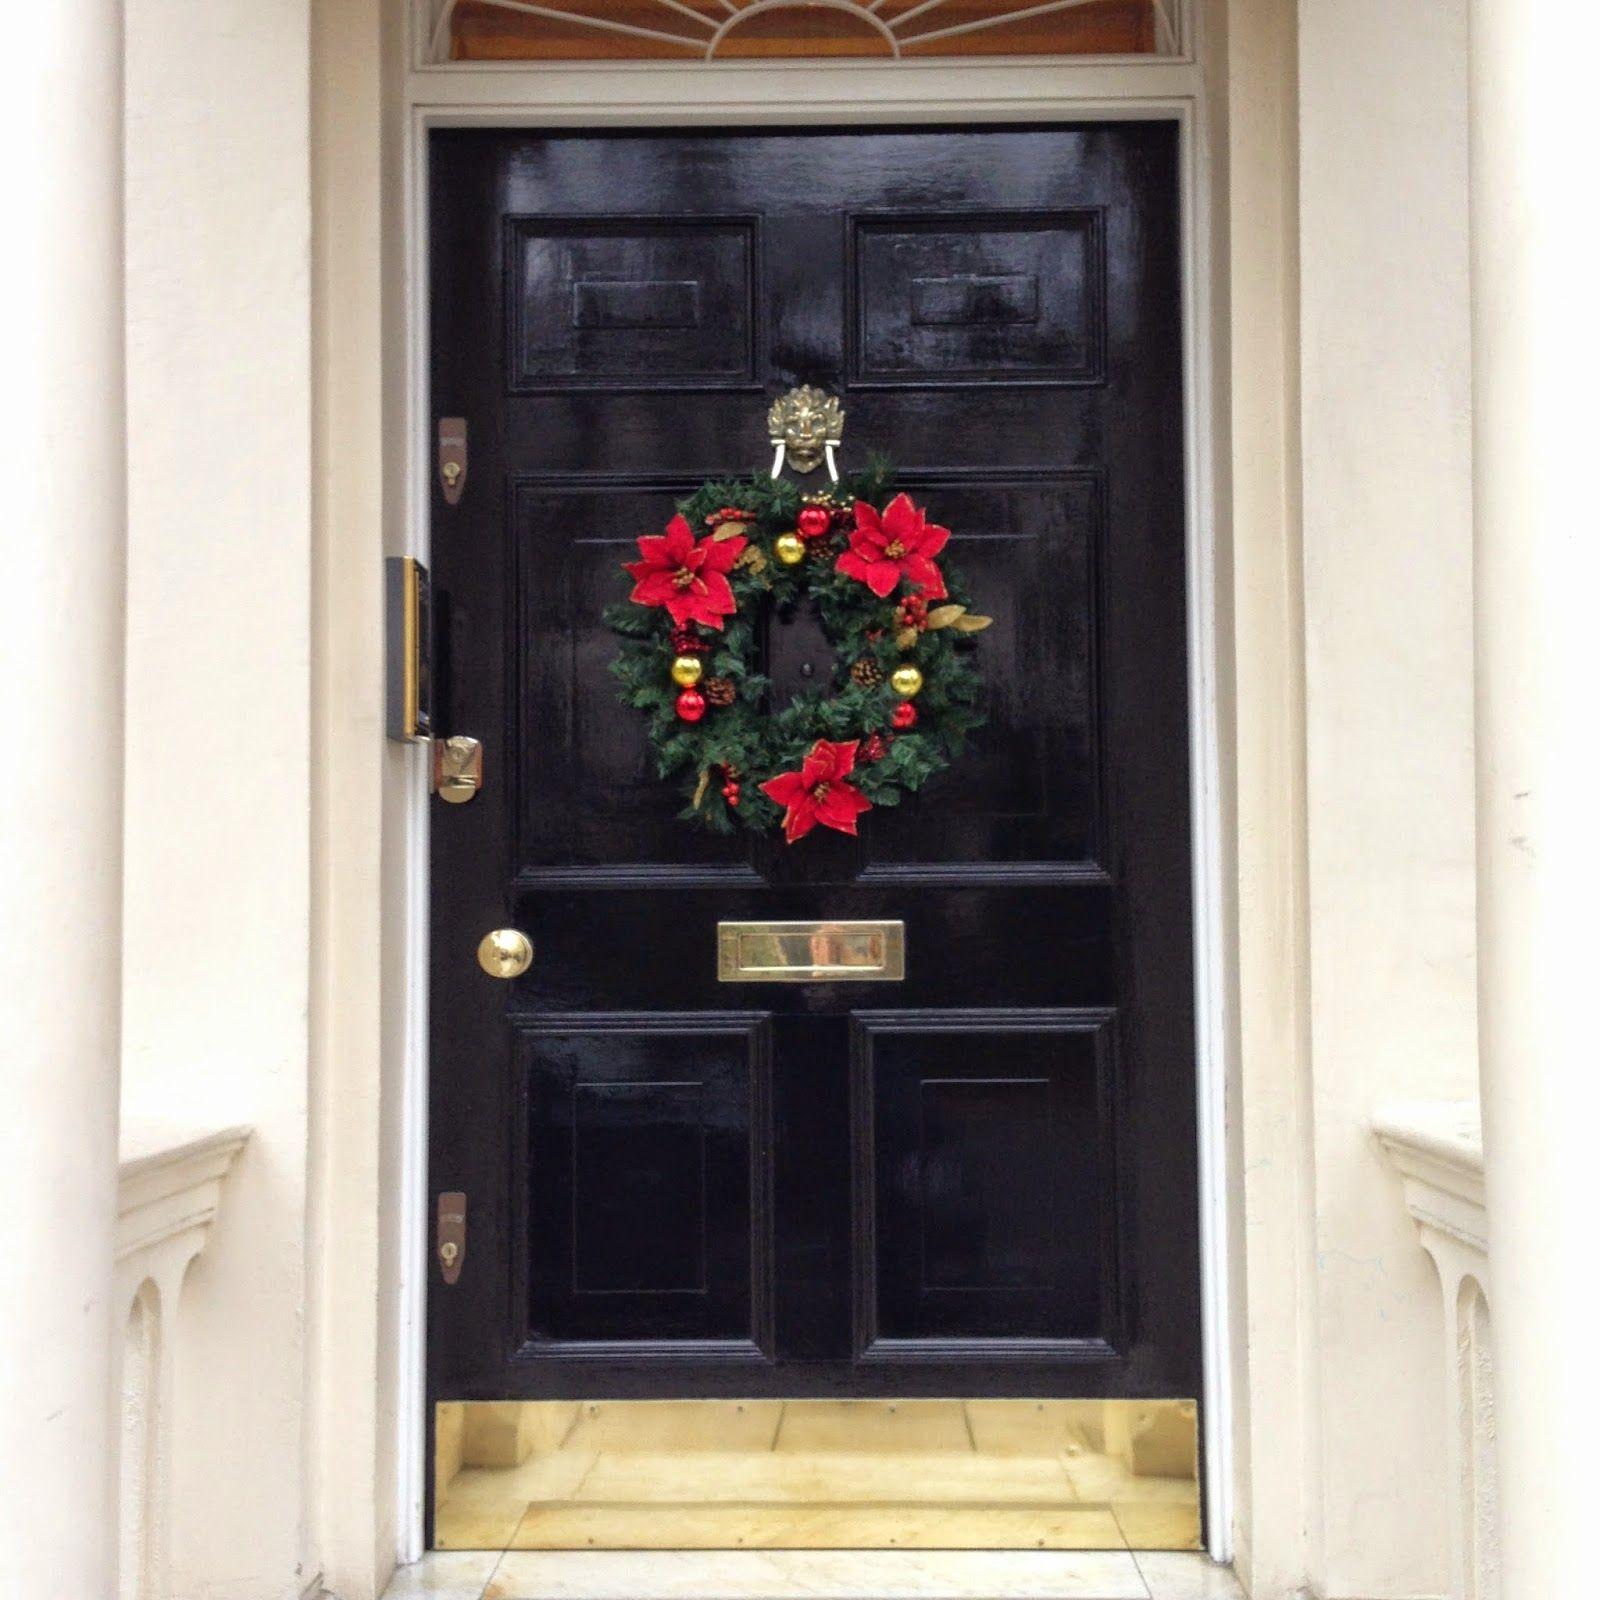 London proper christmas doors in london the influenceher london proper christmas doors in london solutioingenieria Images